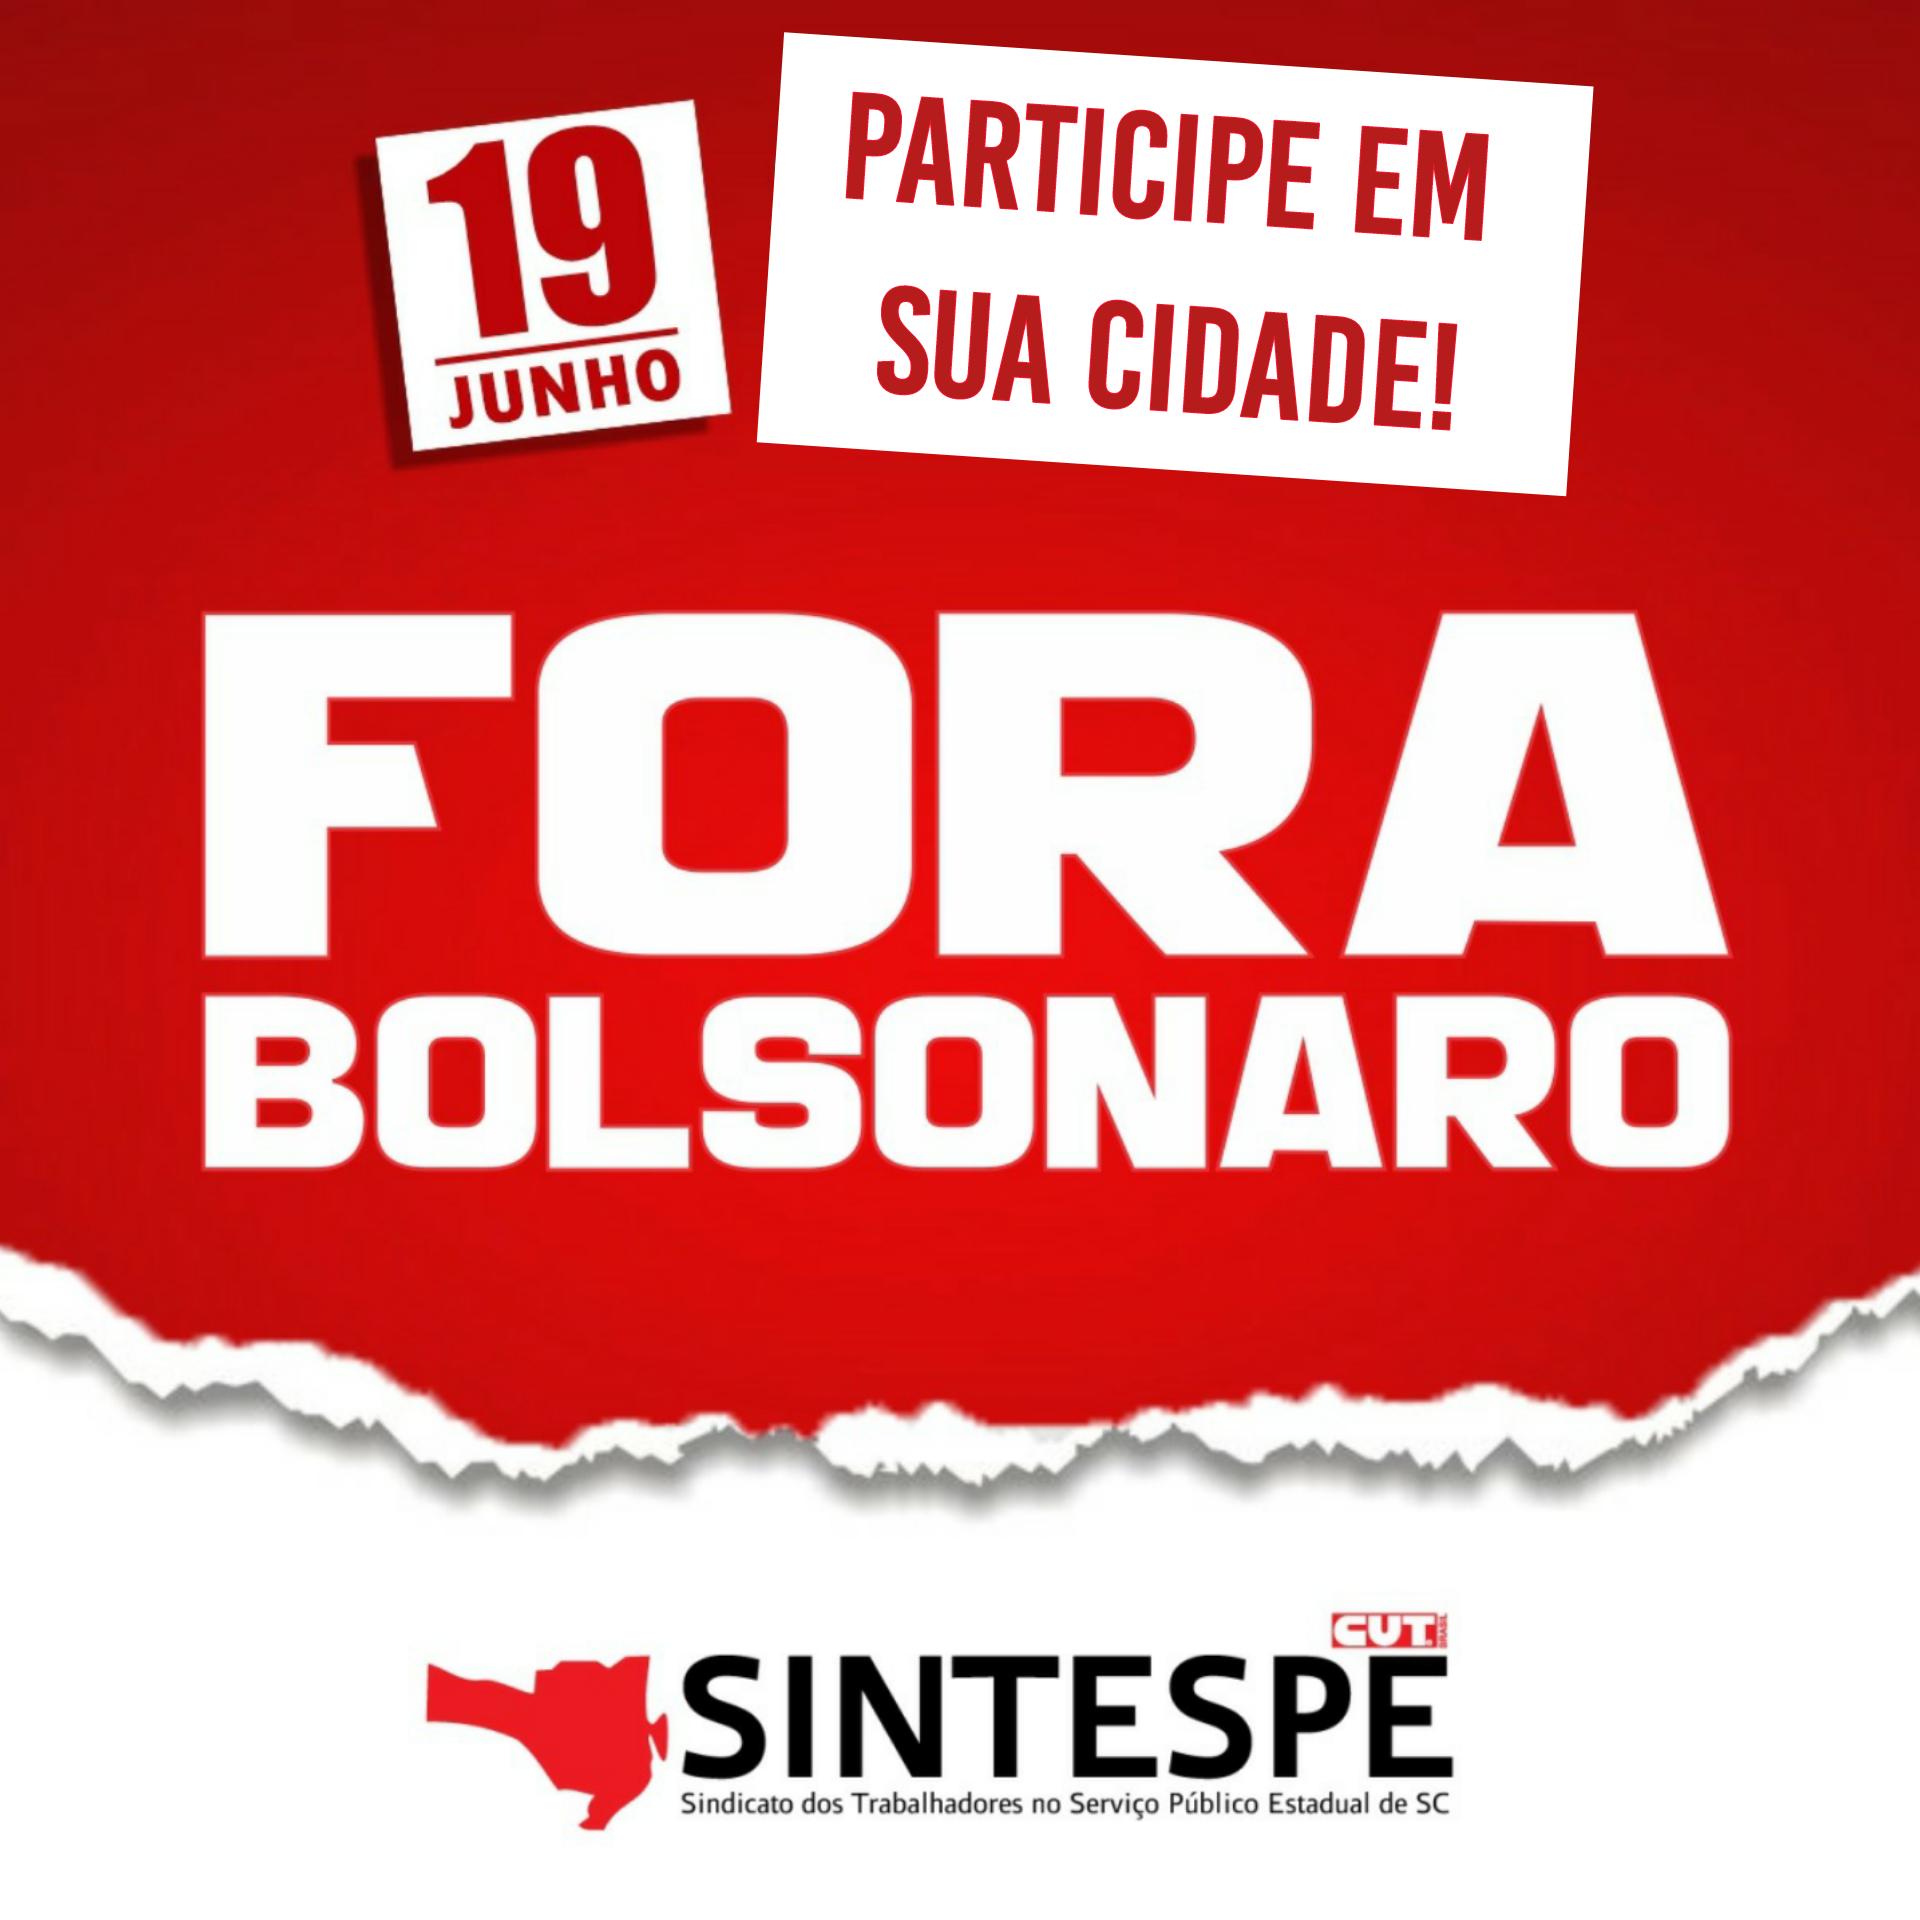 19 DE JUNHO: Hora do funcionalismo estadual dar seu grito!